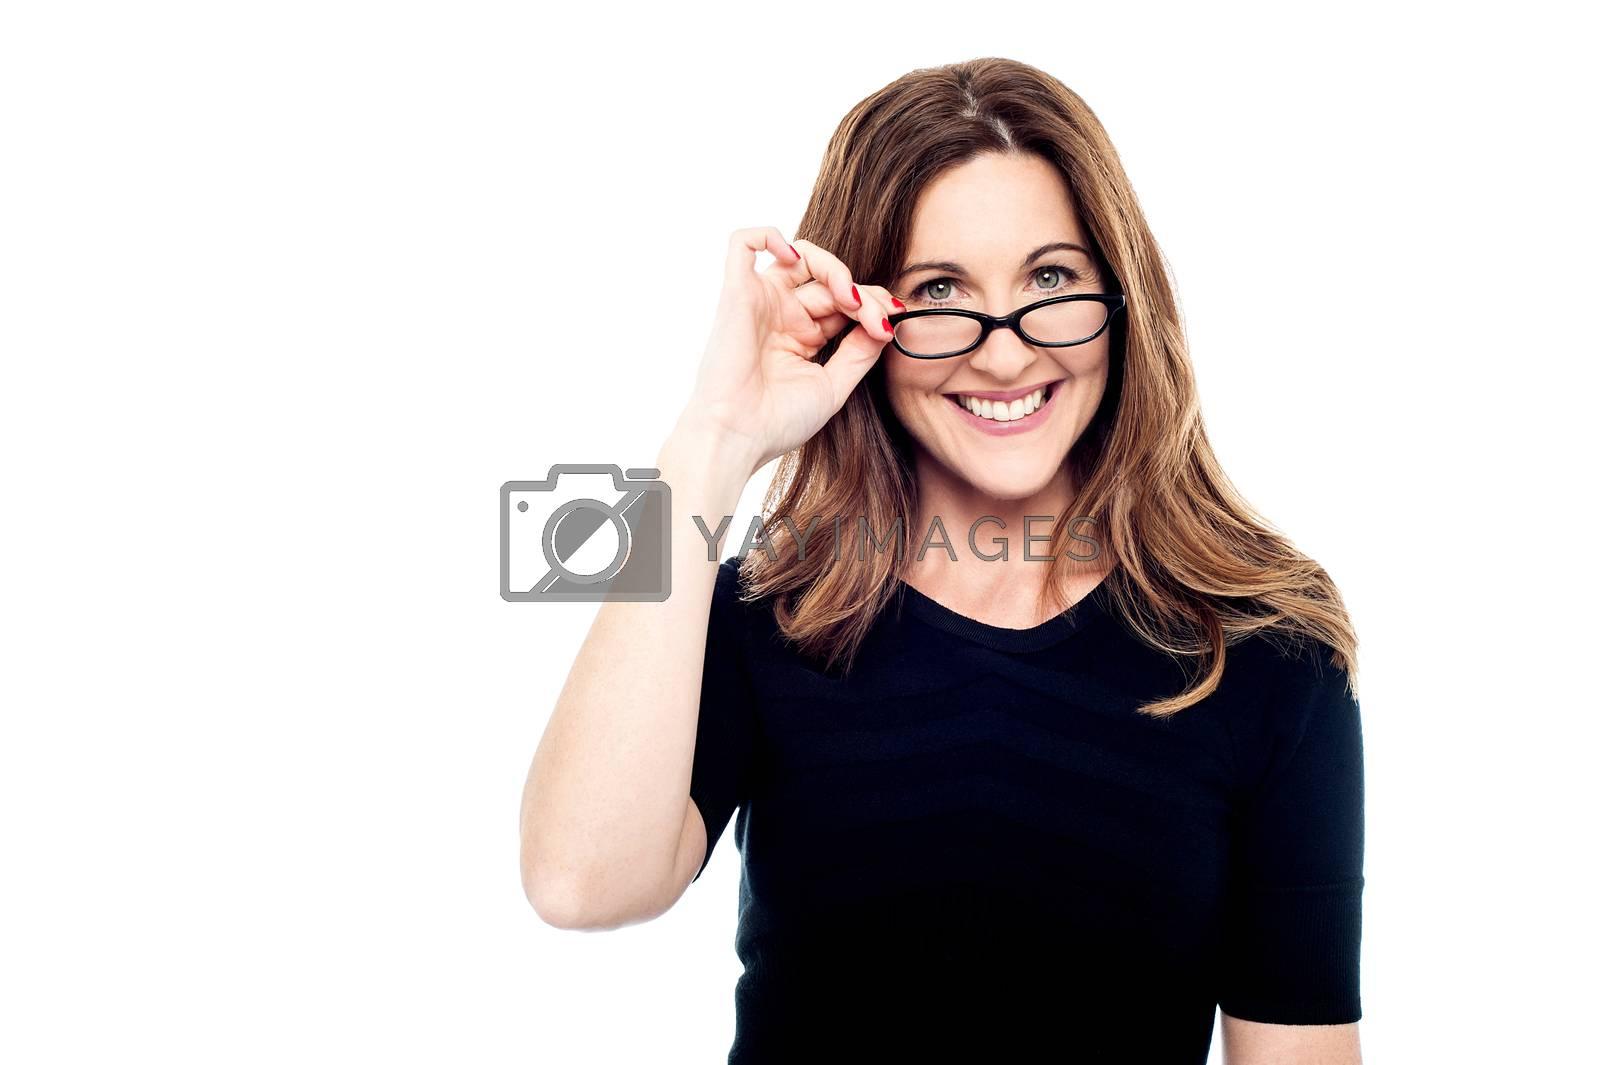 Smiling woman adjusting her eyeglasses